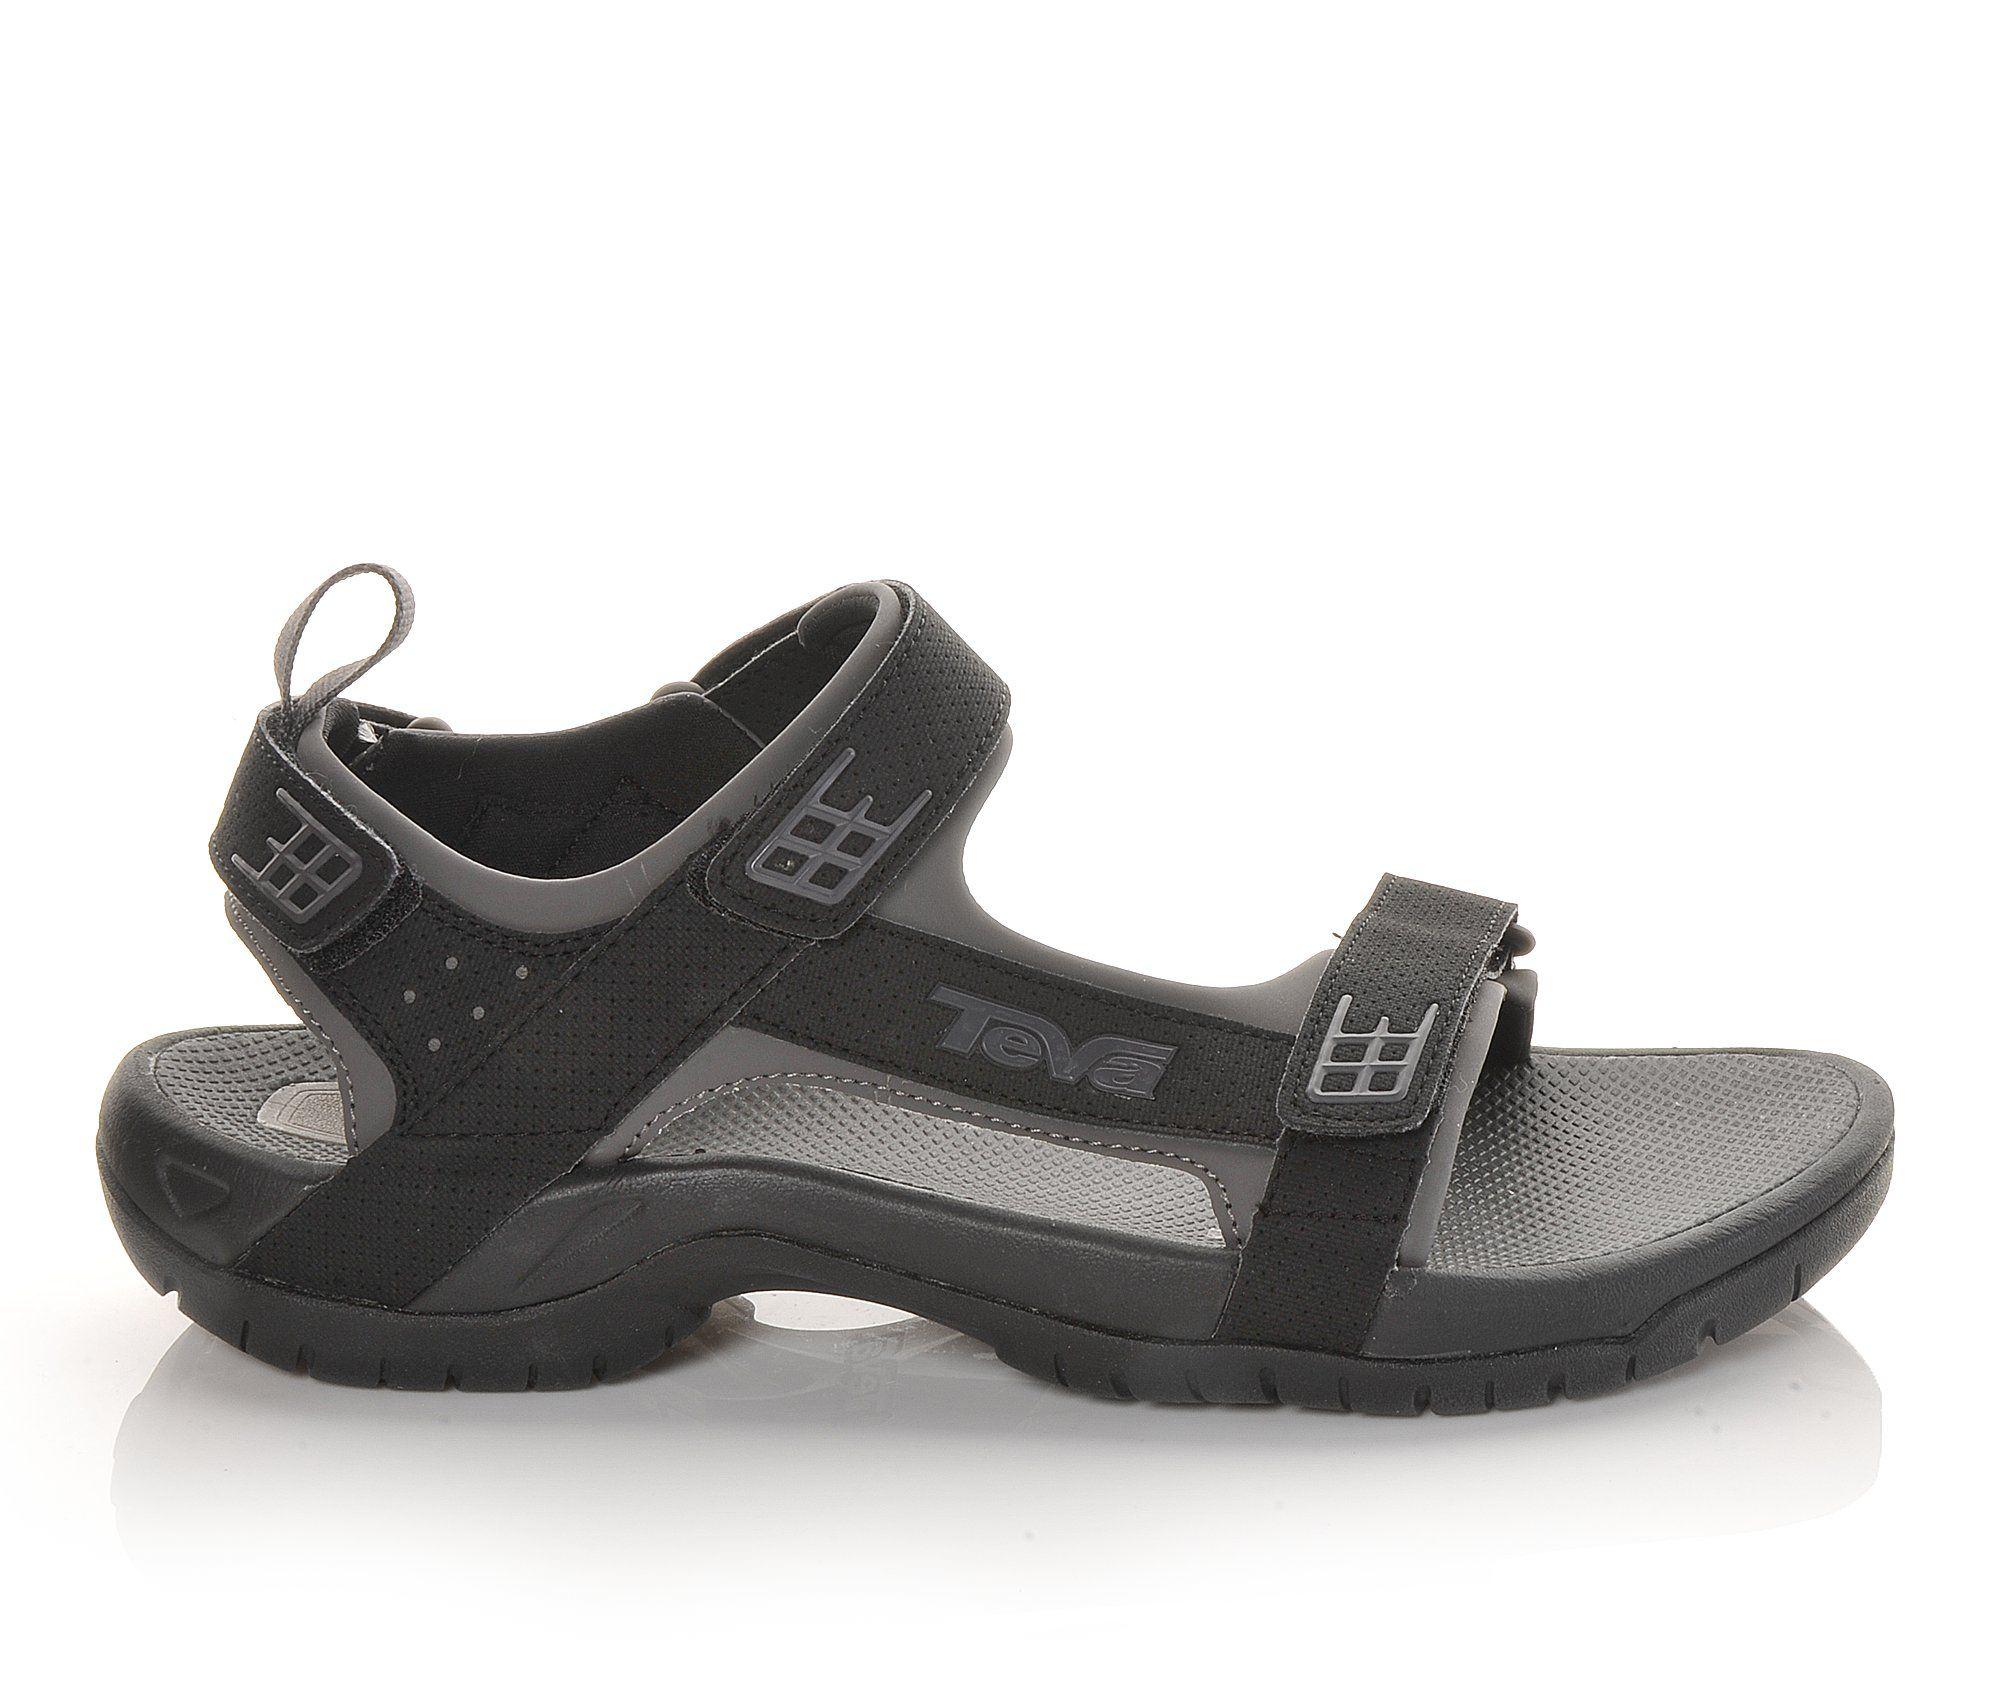 Men's Teva Minam Sandals (Black)